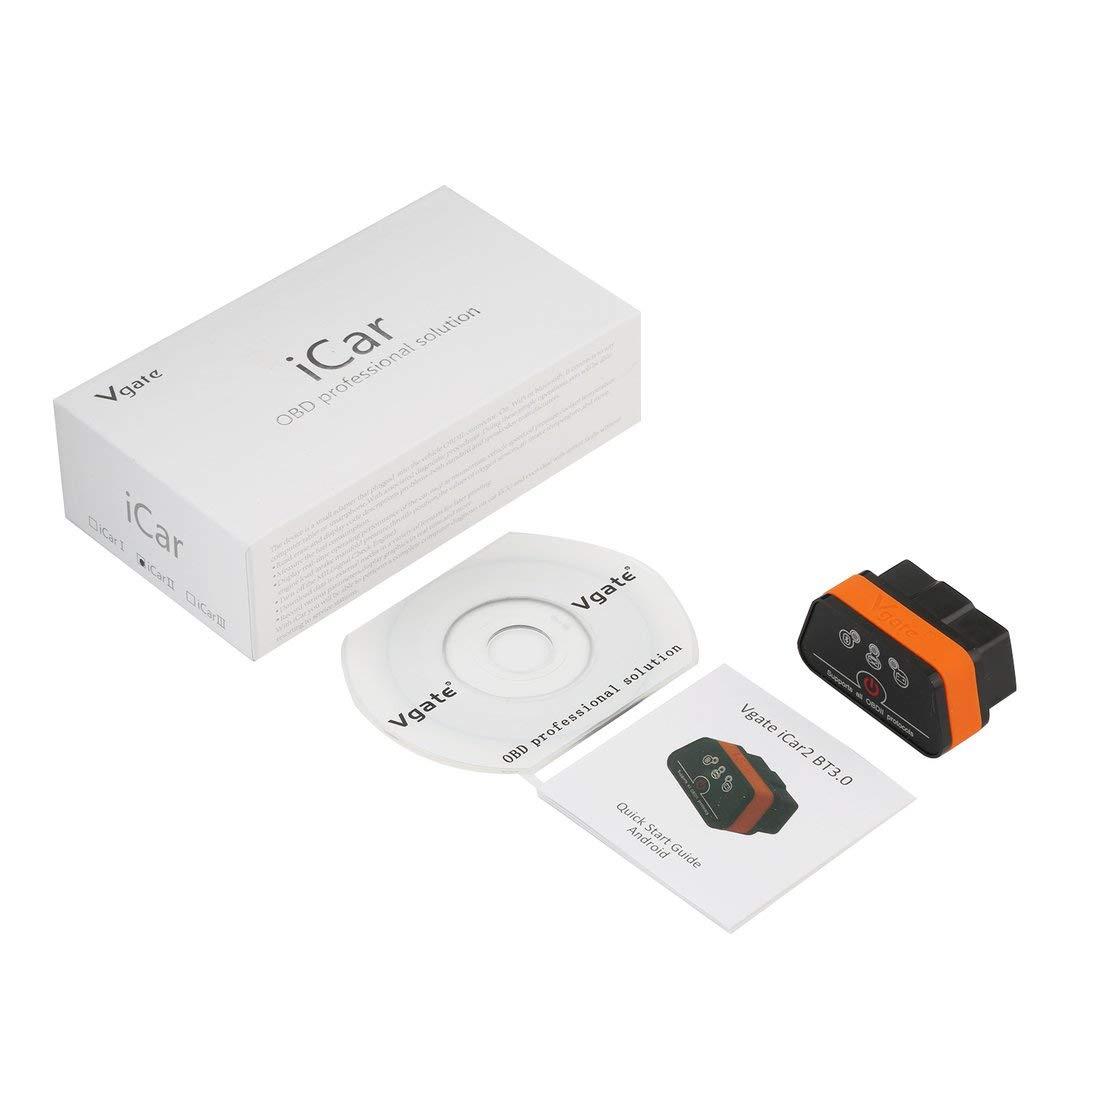 Lector de có digo Bluetooth Vgate iCar2 Disponible Bluetooth Auto OBDII Vgate iCar 2 Tipo Bluetooth Adaptador pequeñ o con 6 Colores Formulaone